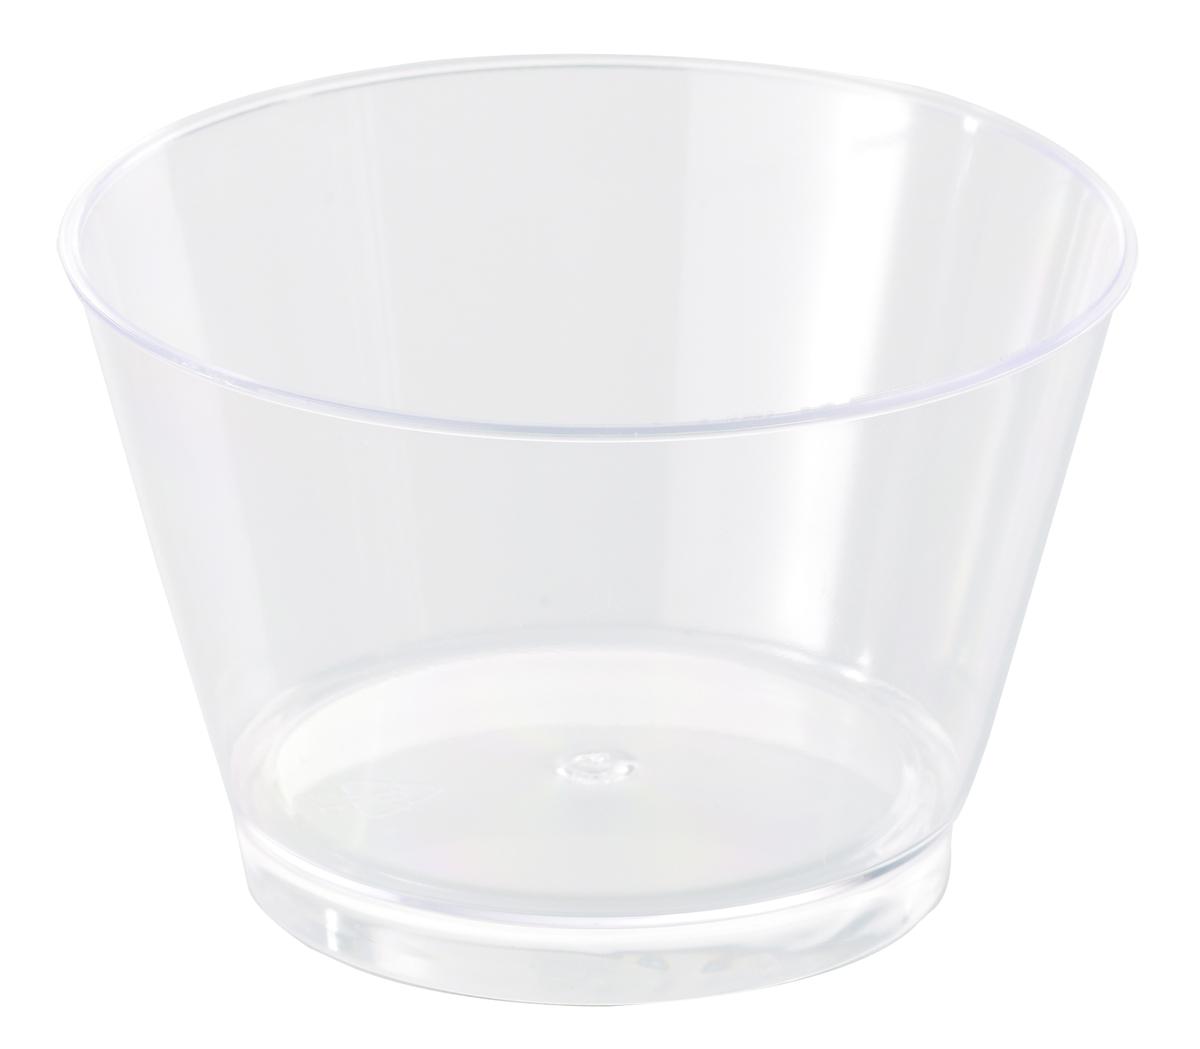 Verrine conique transparente Ø 8 cm 15 cl Solia (100 pièces)